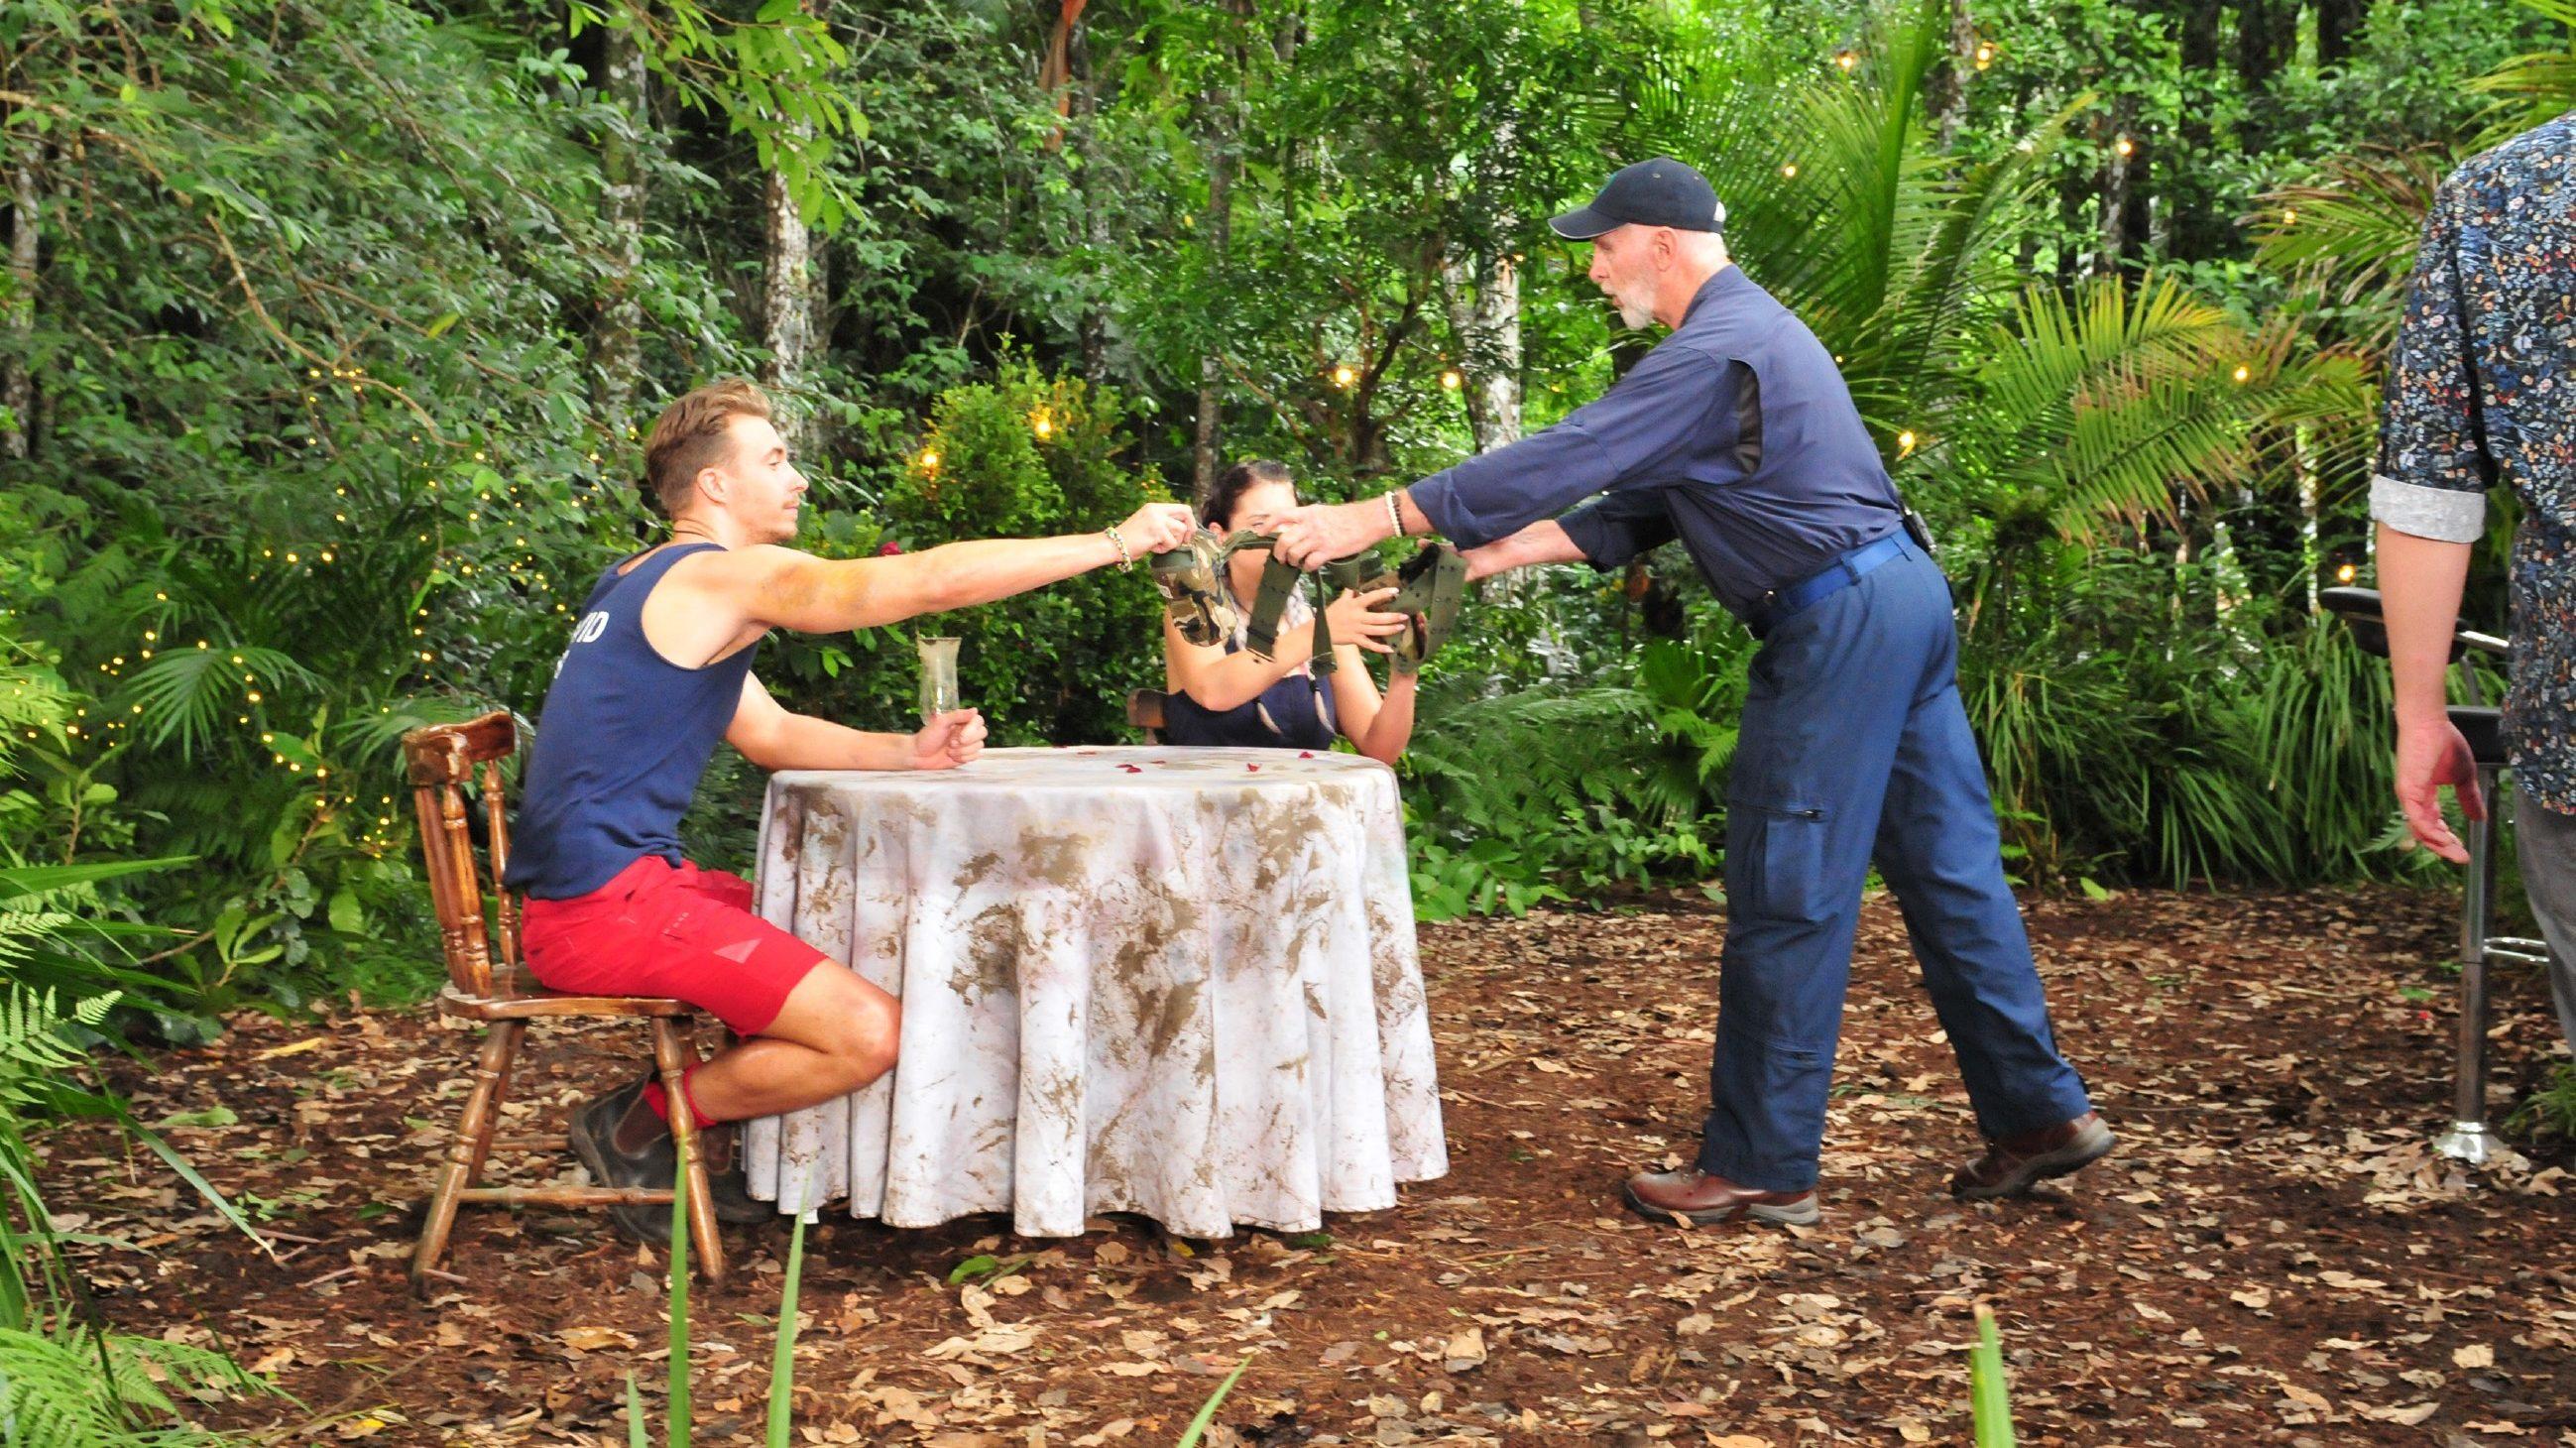 Dschungelpruefung 30 Januar 2018 Qualentinstag